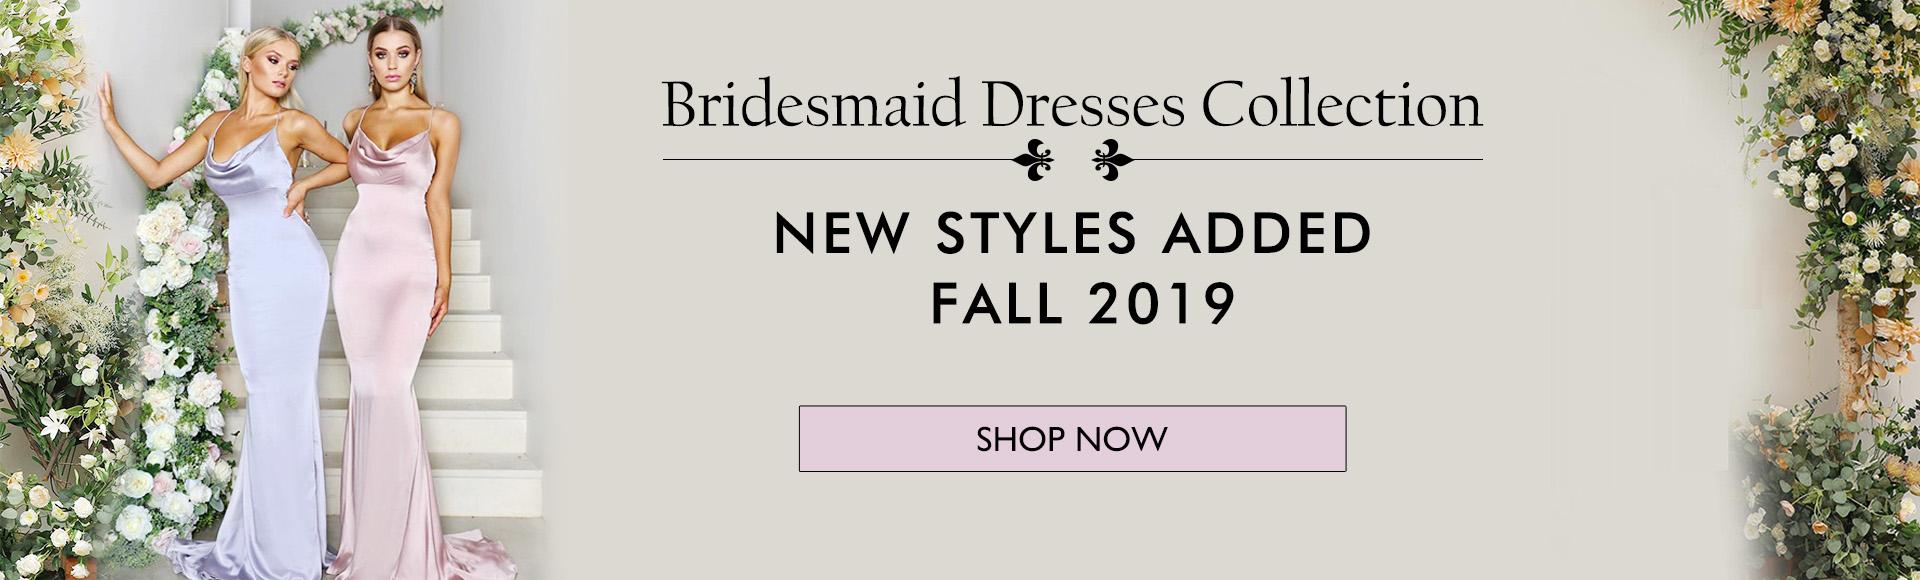 Bridesmaid Dresses 2019